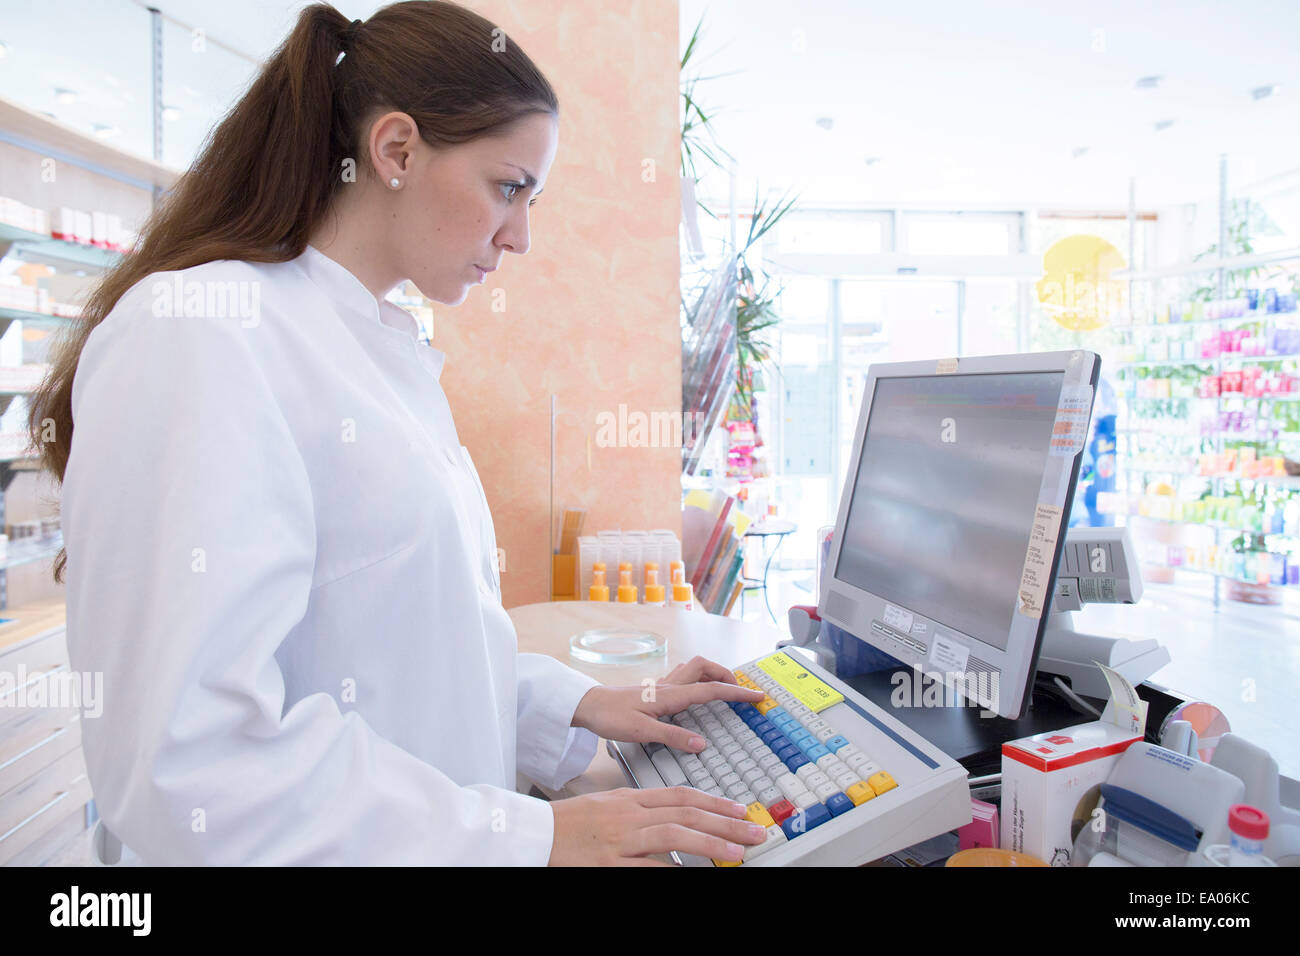 Pharmacist in pharmacy using computer - Stock Image